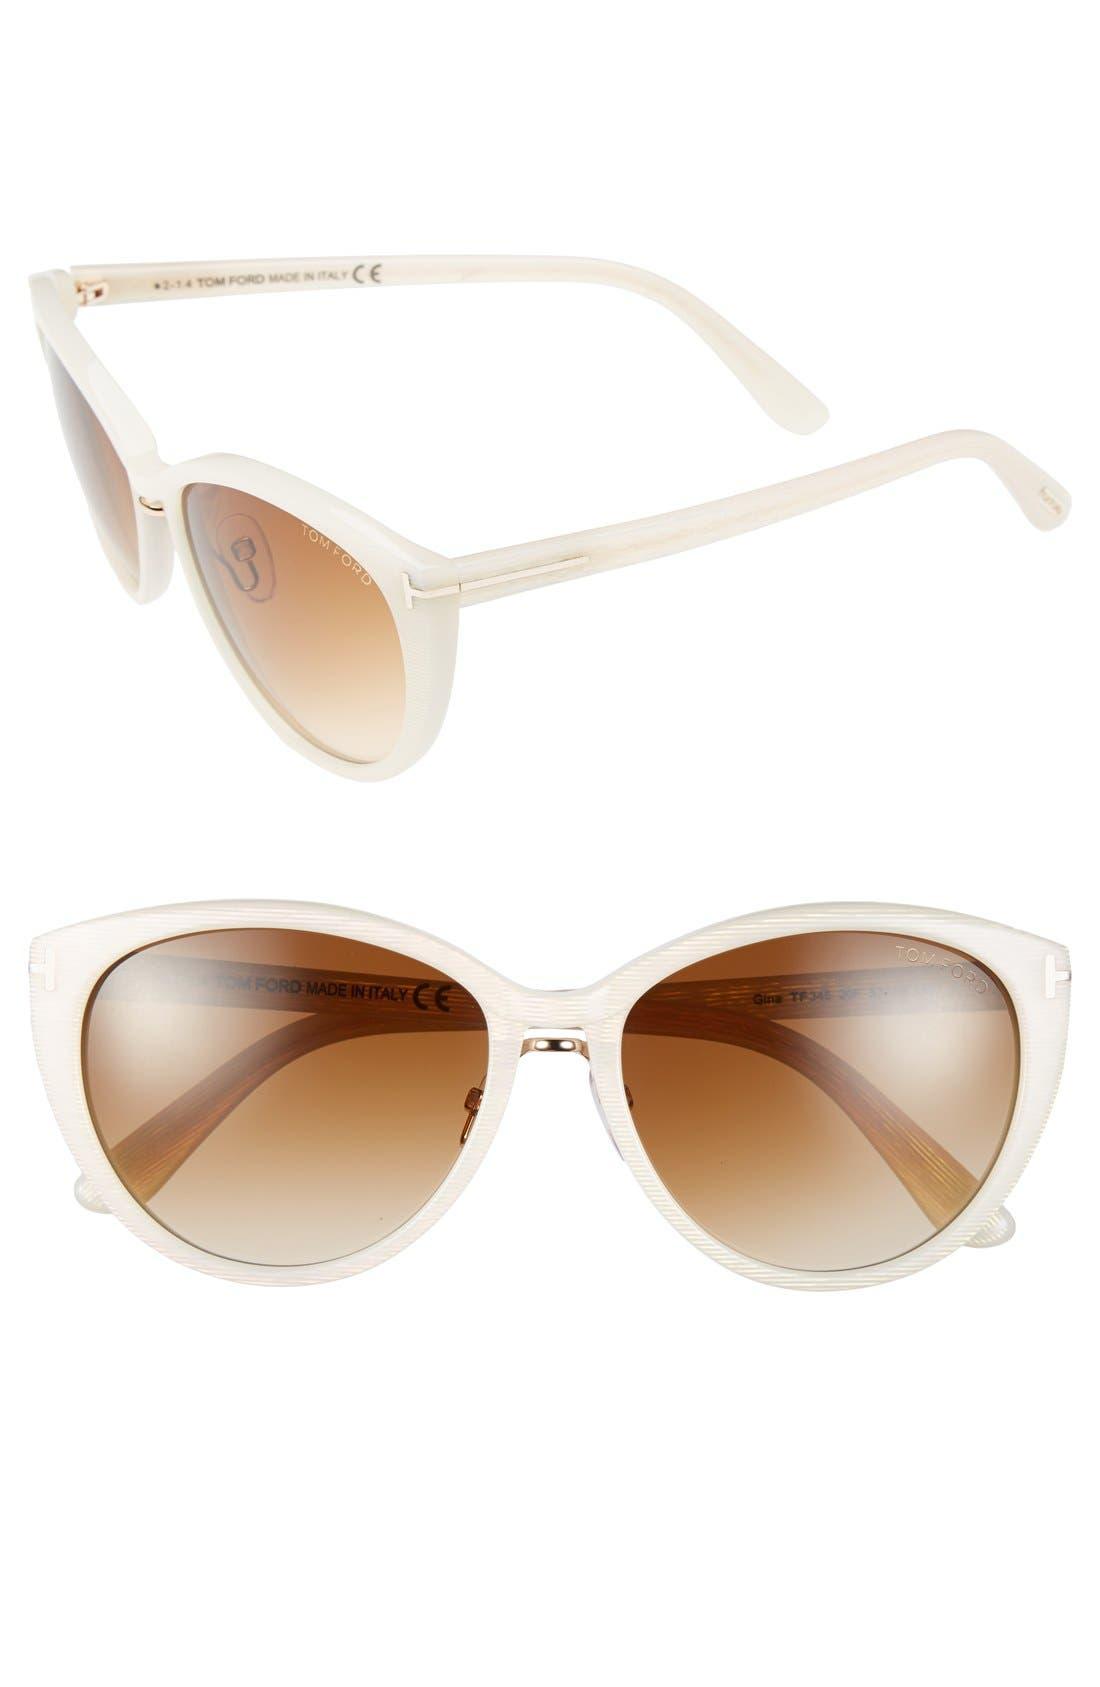 Alternate Image 1 Selected - Tom Ford 'Gina' 57mm Cat Eye Sunglasses